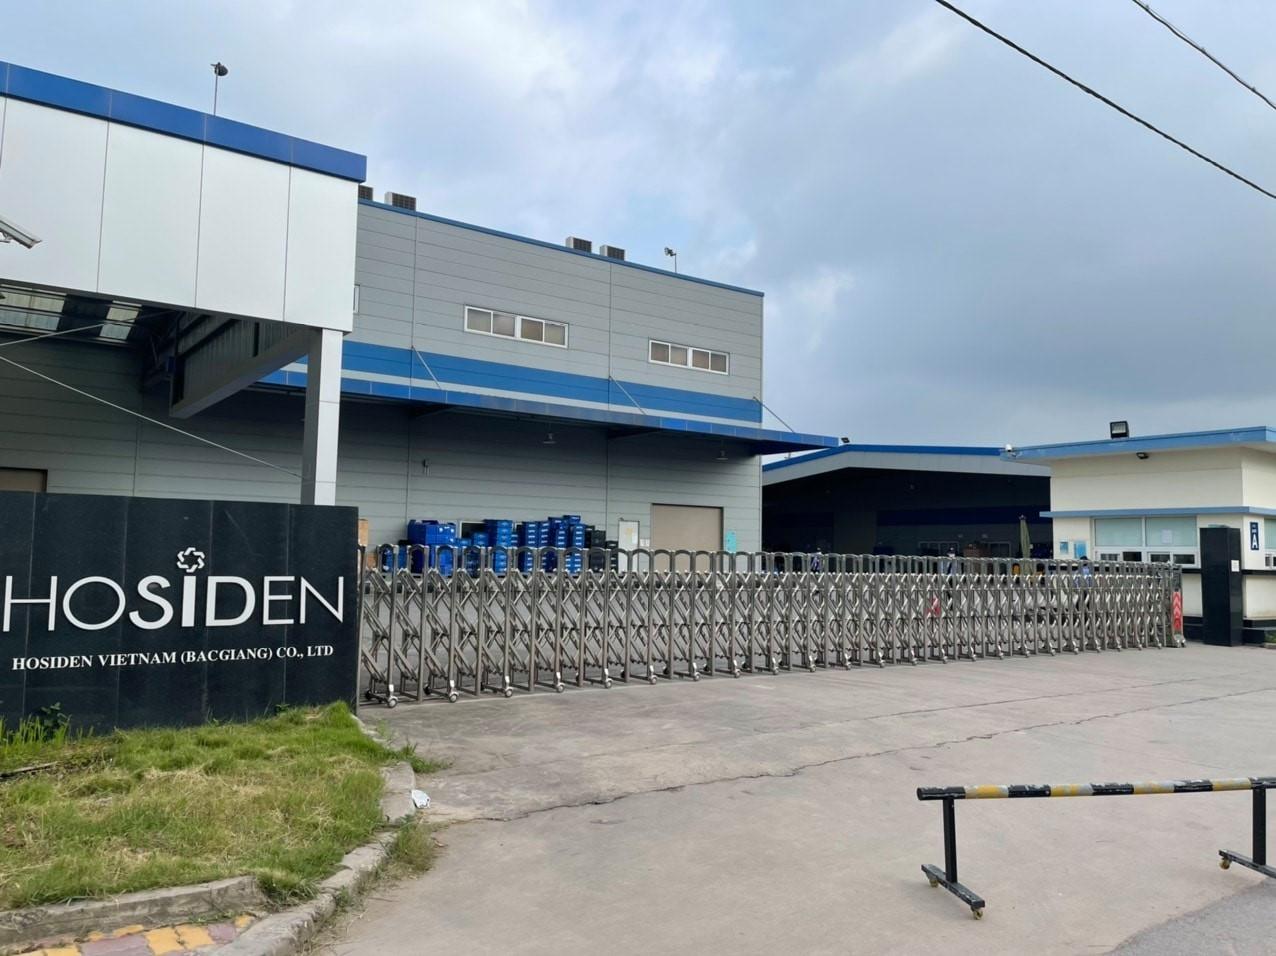 Field hospital to be built in Bac Giang amid coronavirus surge